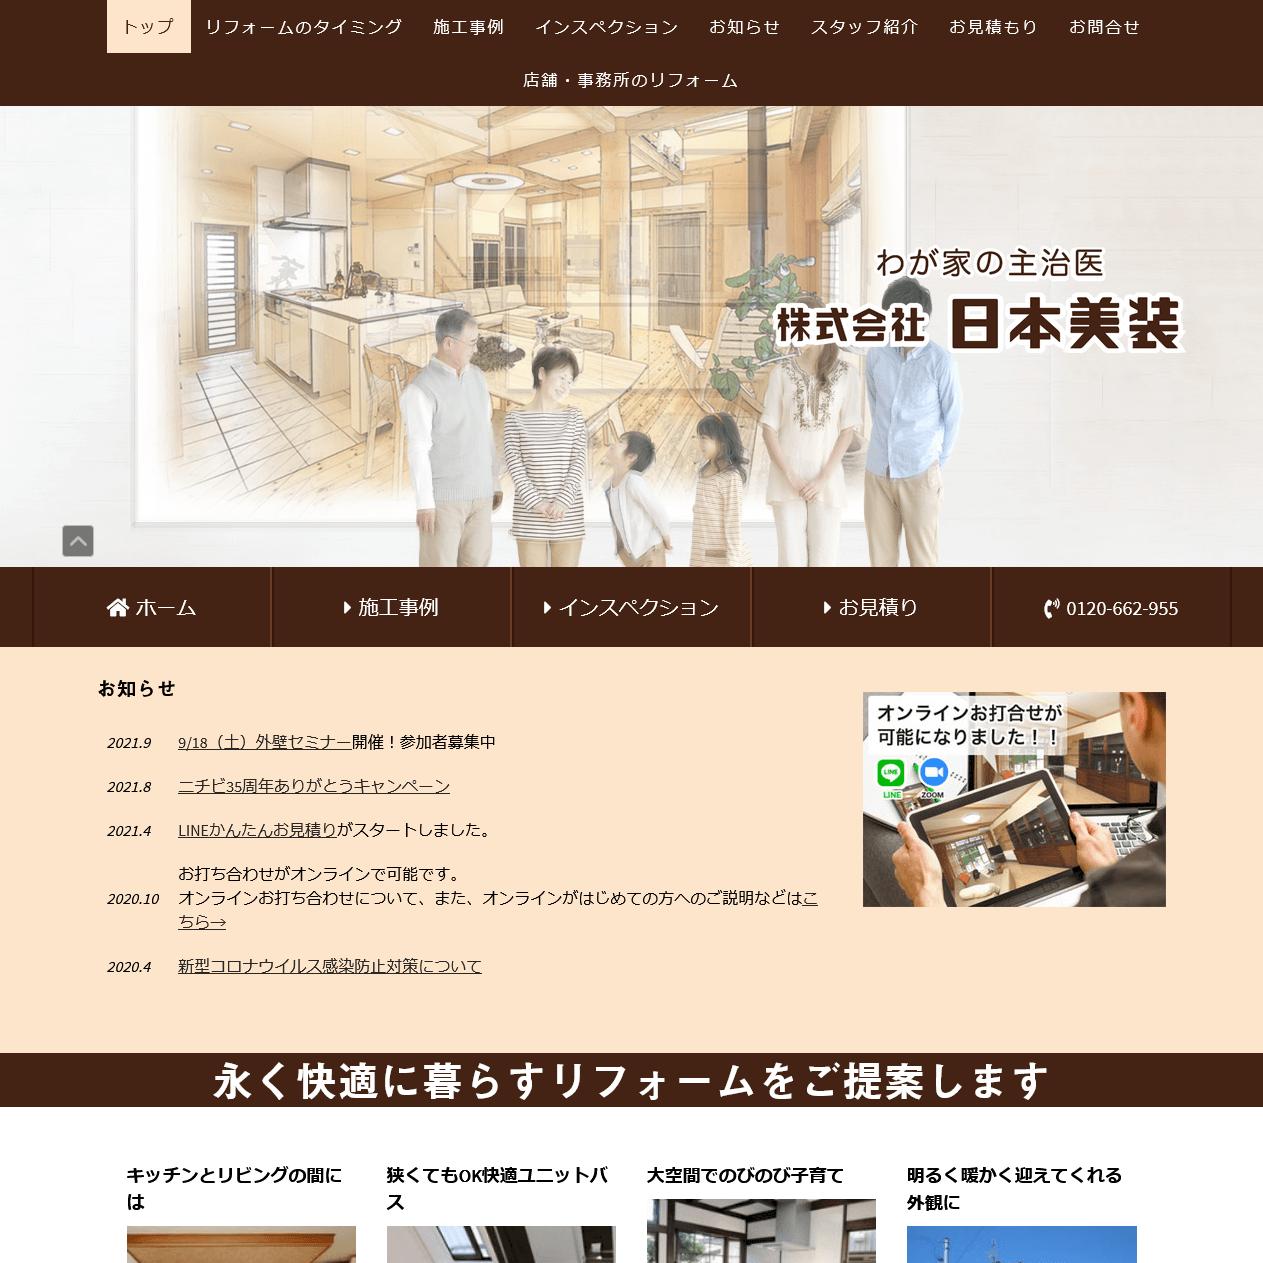 "<span class=""title"">株式会社日本美装の口コミや評判</span>"